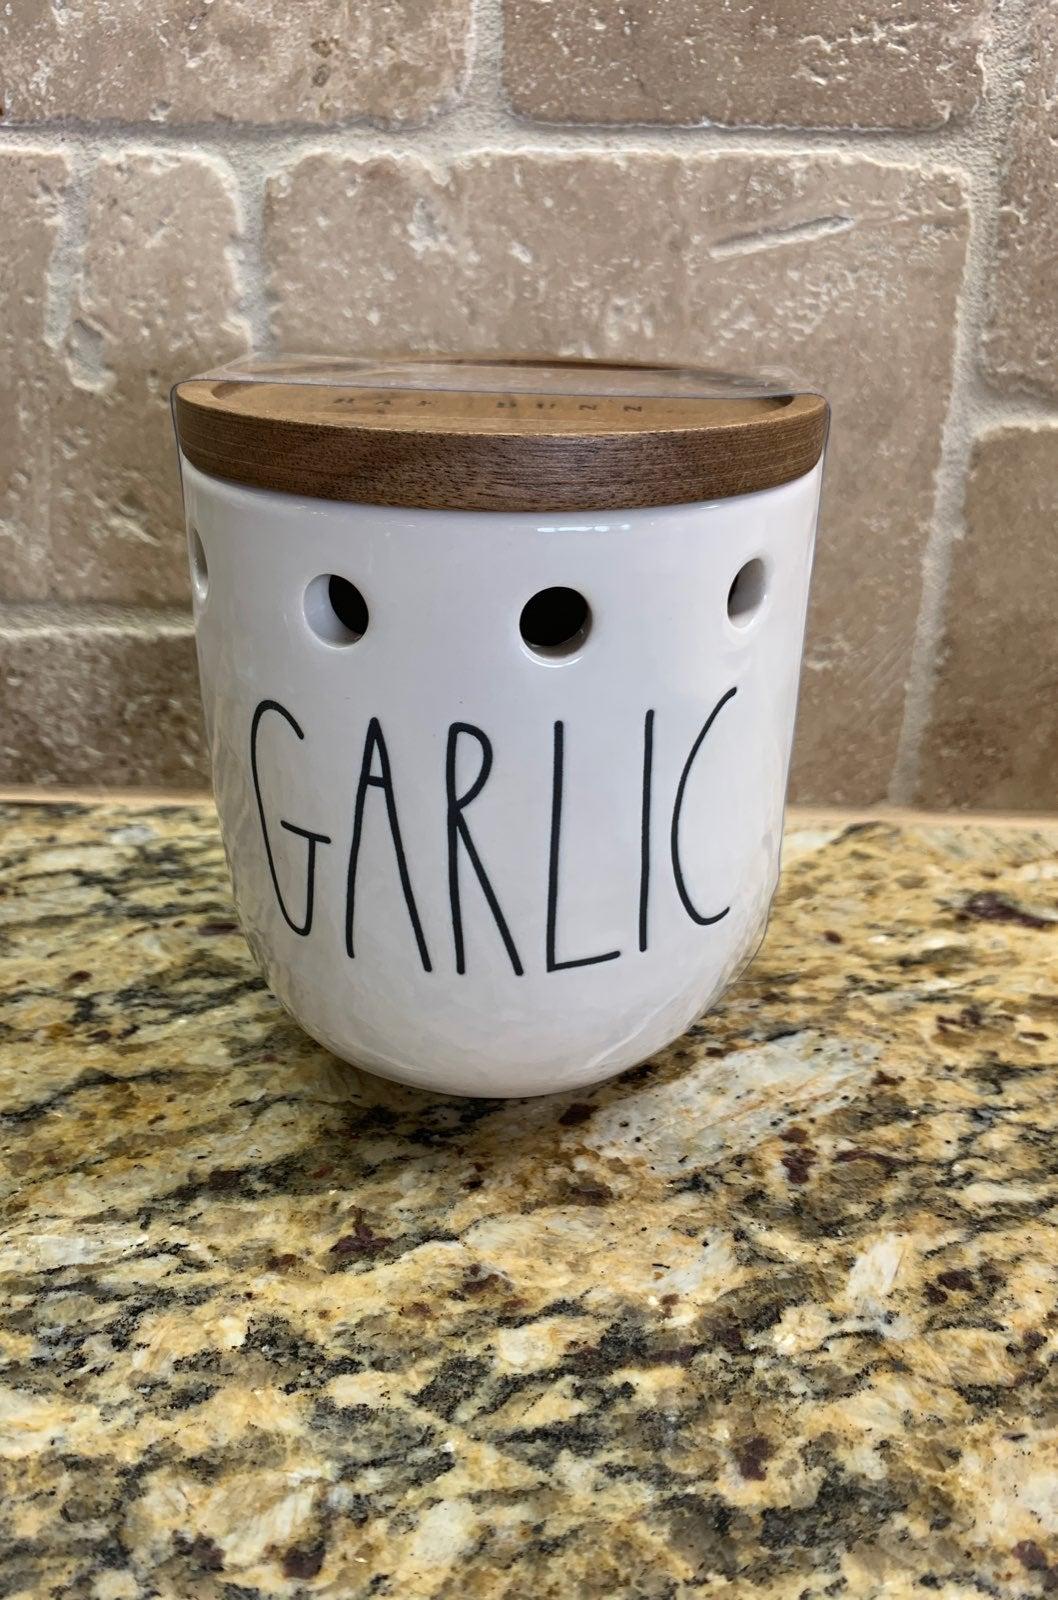 Rae Dunn Garlic canister